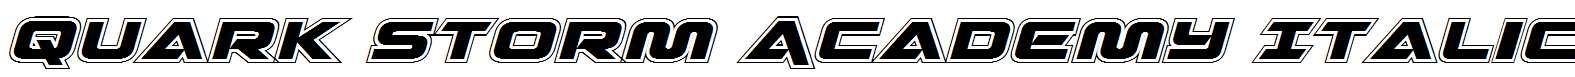 Quark-Storm-Academy-Italic